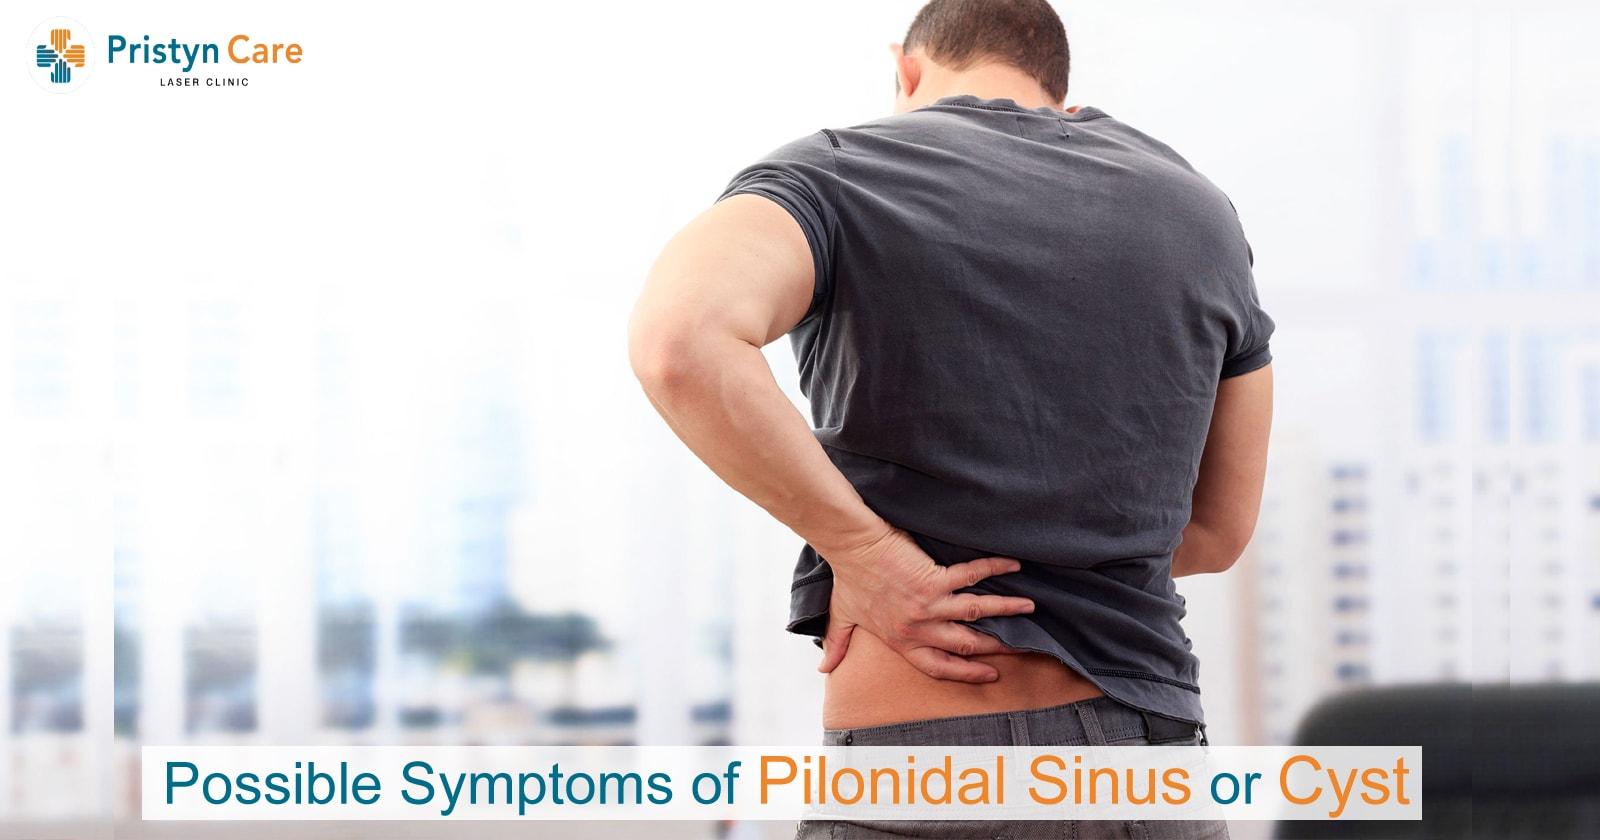 Possible Symptoms of Pilonidal Sinus or Cyst